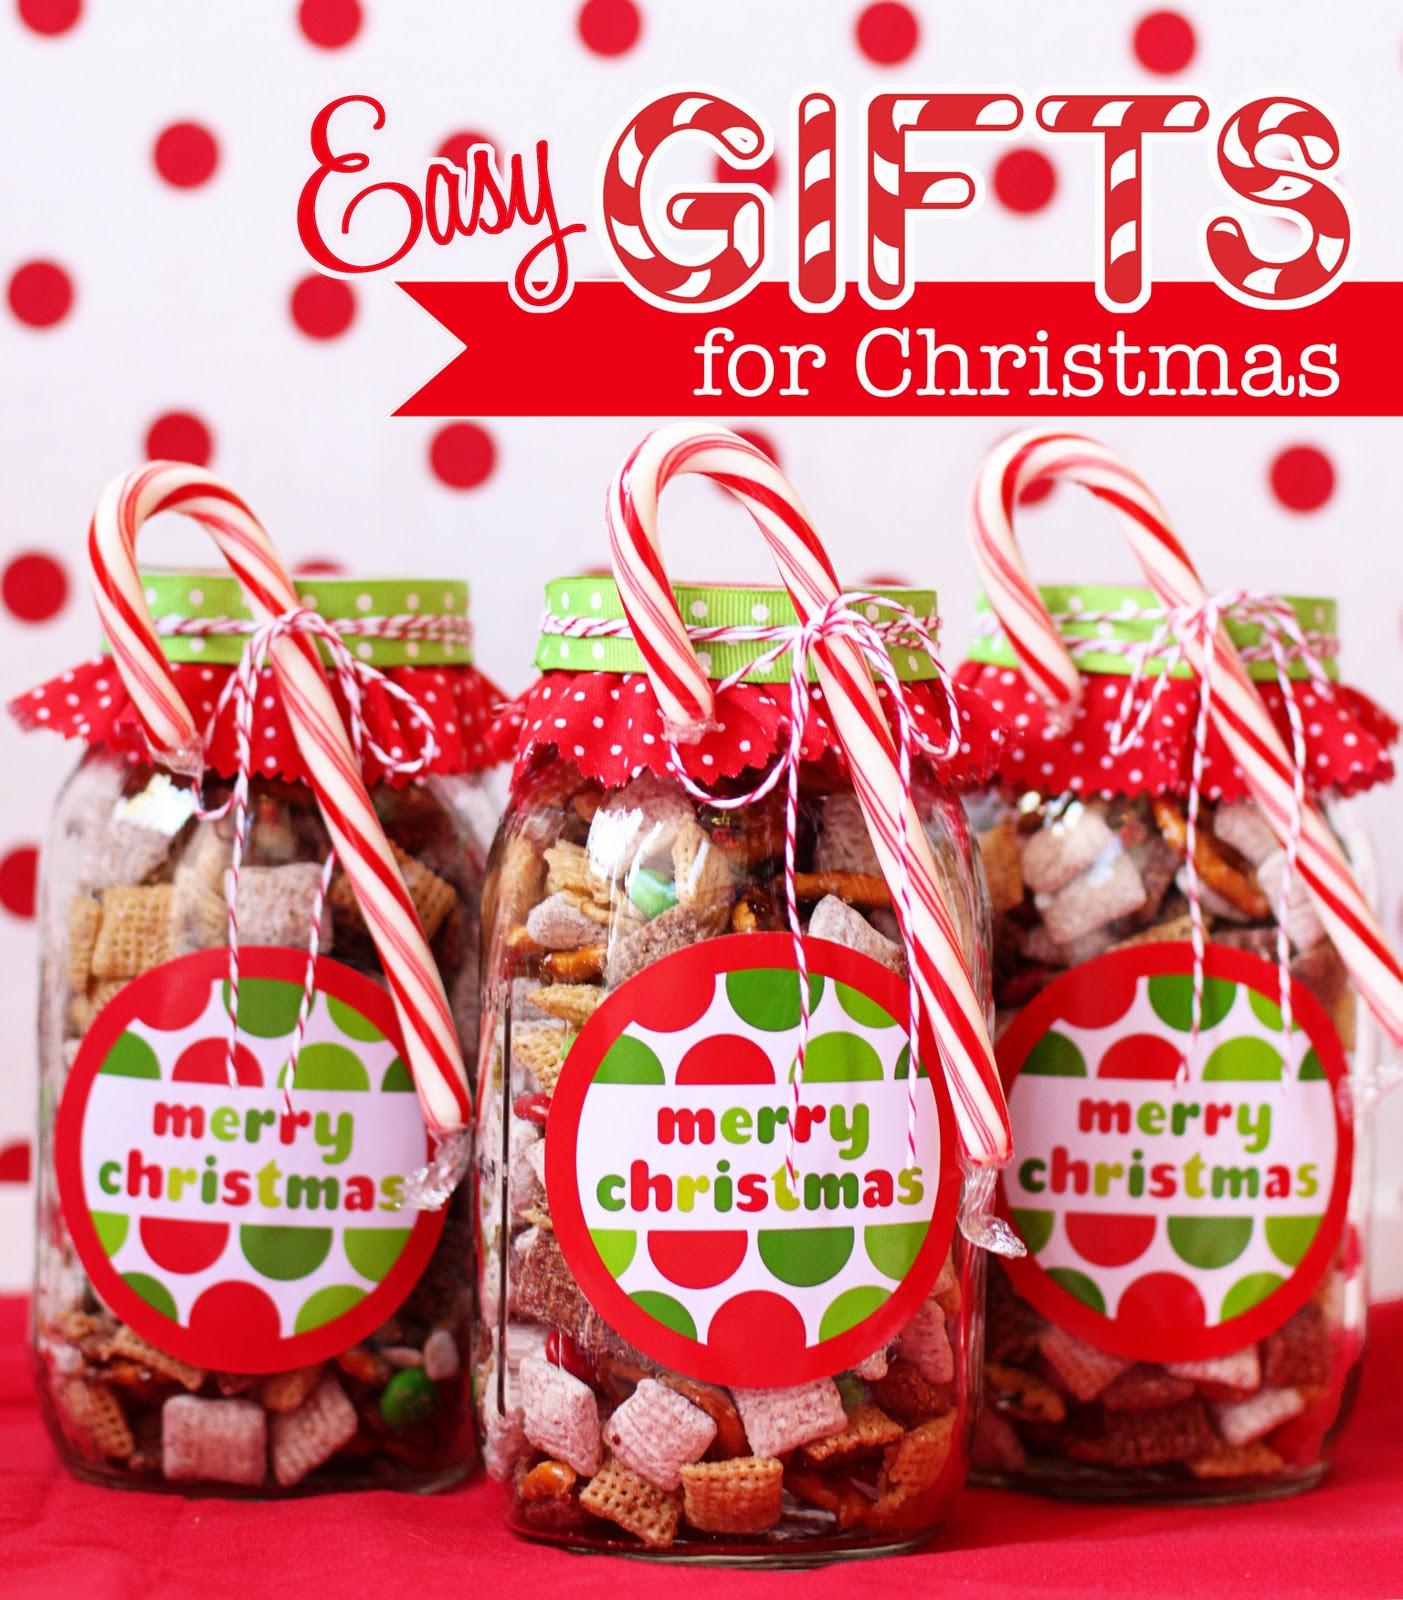 Easy Christmas Gift Ideas  25 Edible Neighbor Gifts The 36th AVENUE